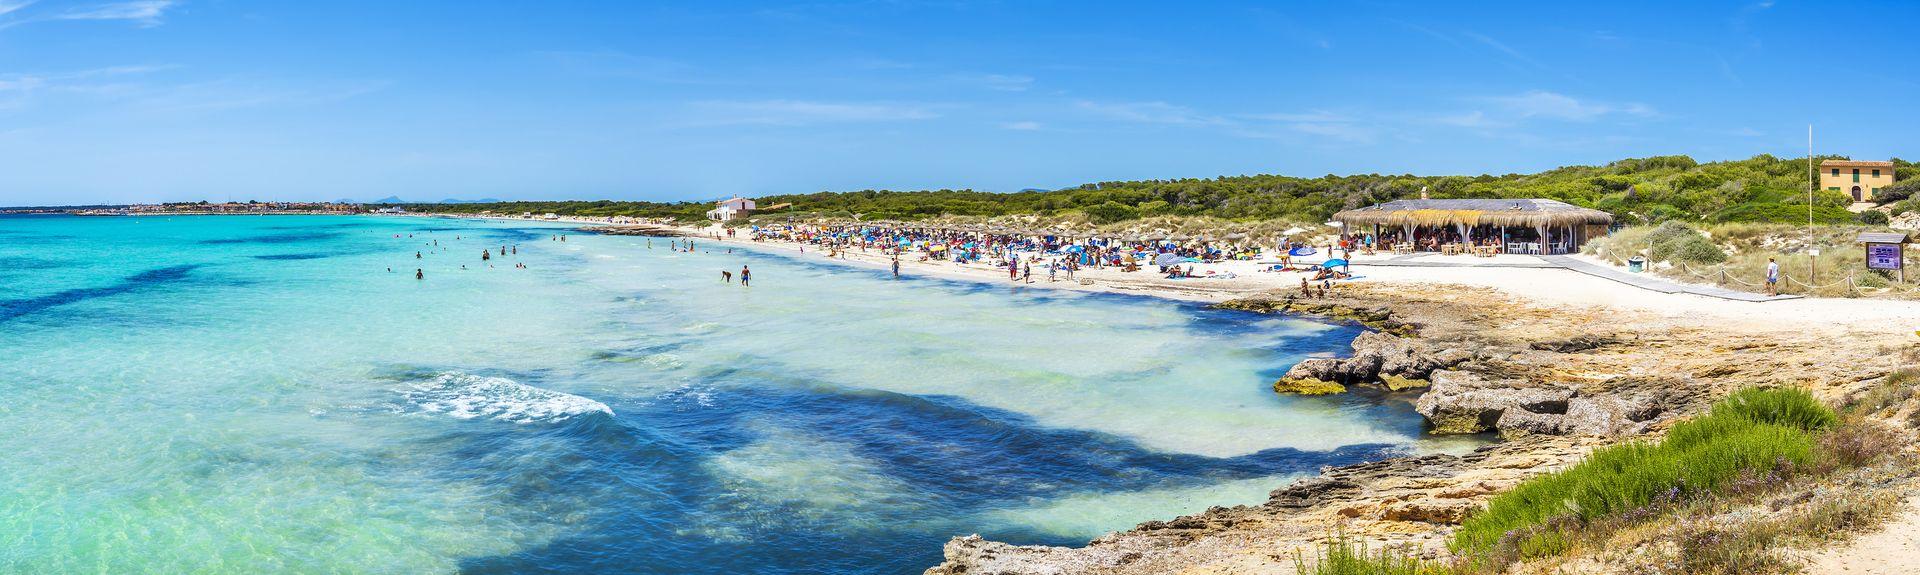 Campos, Balearic Islands, Spain